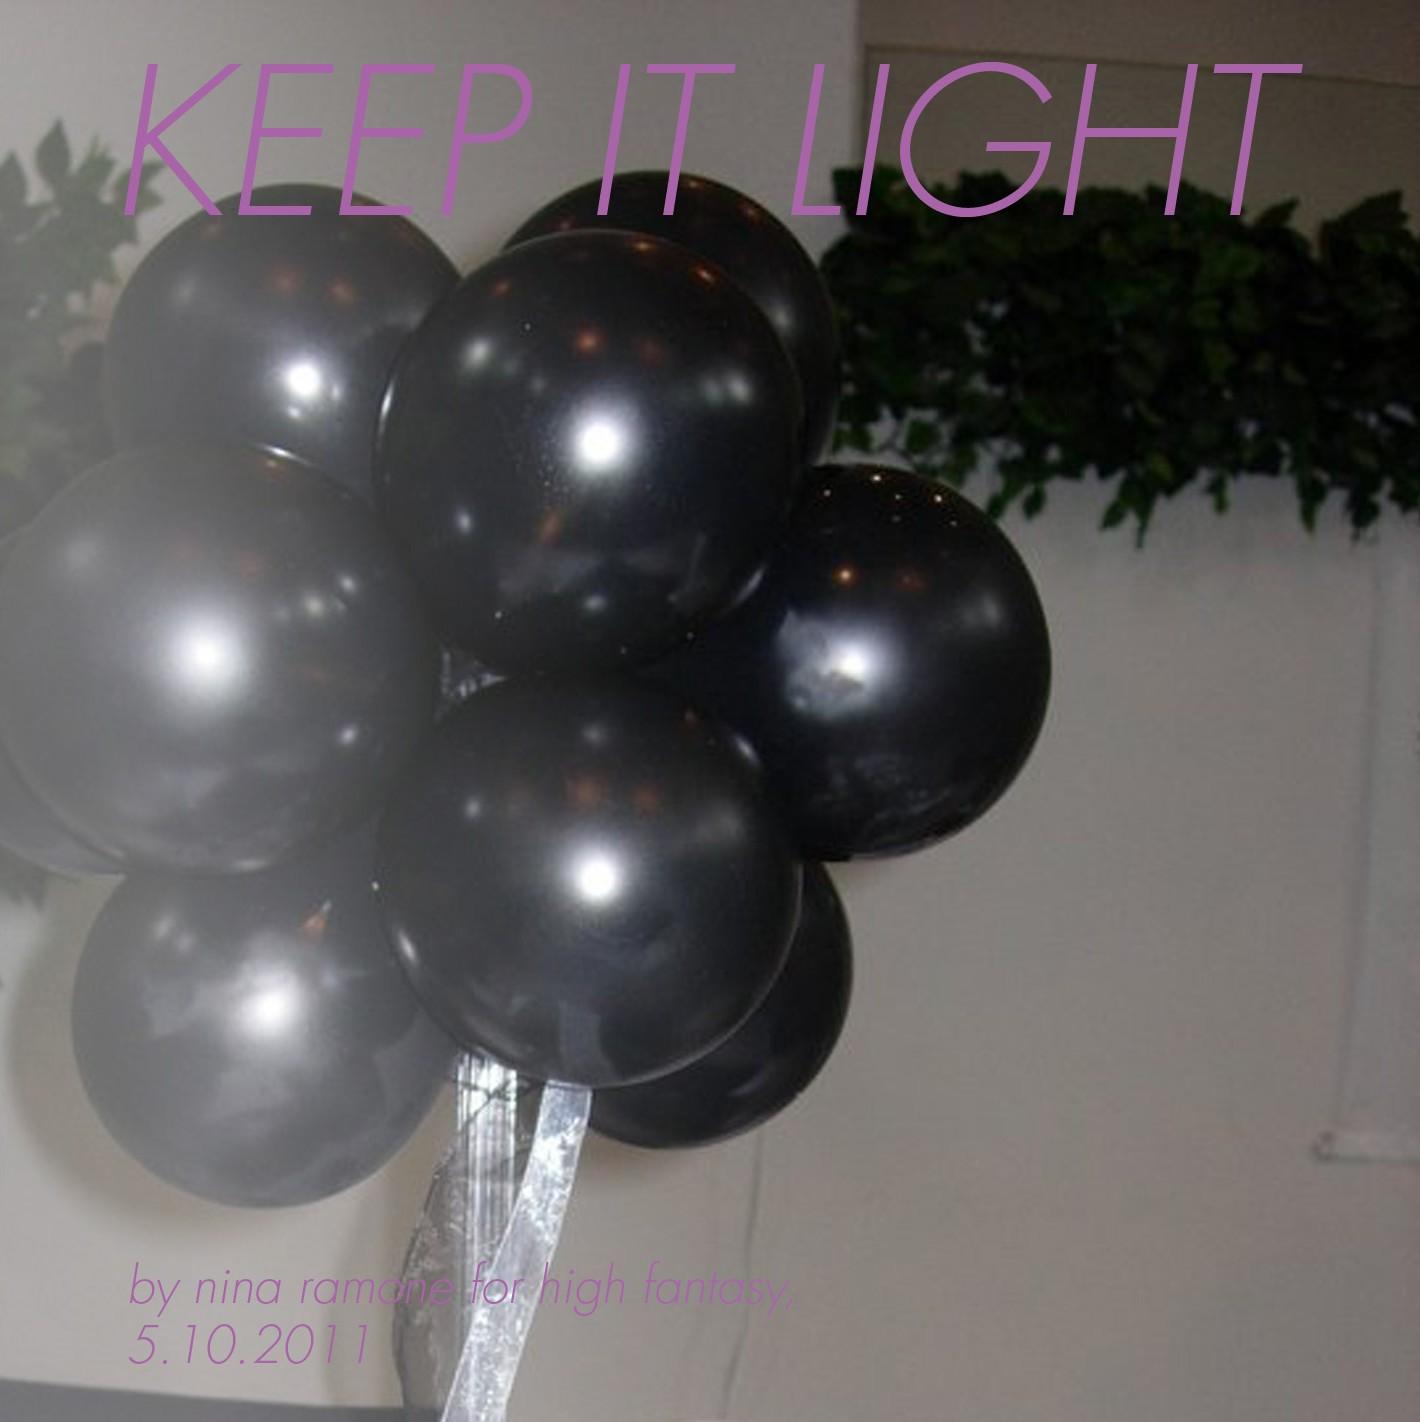 Keep It Light (4 HIGH FANTASY SF)